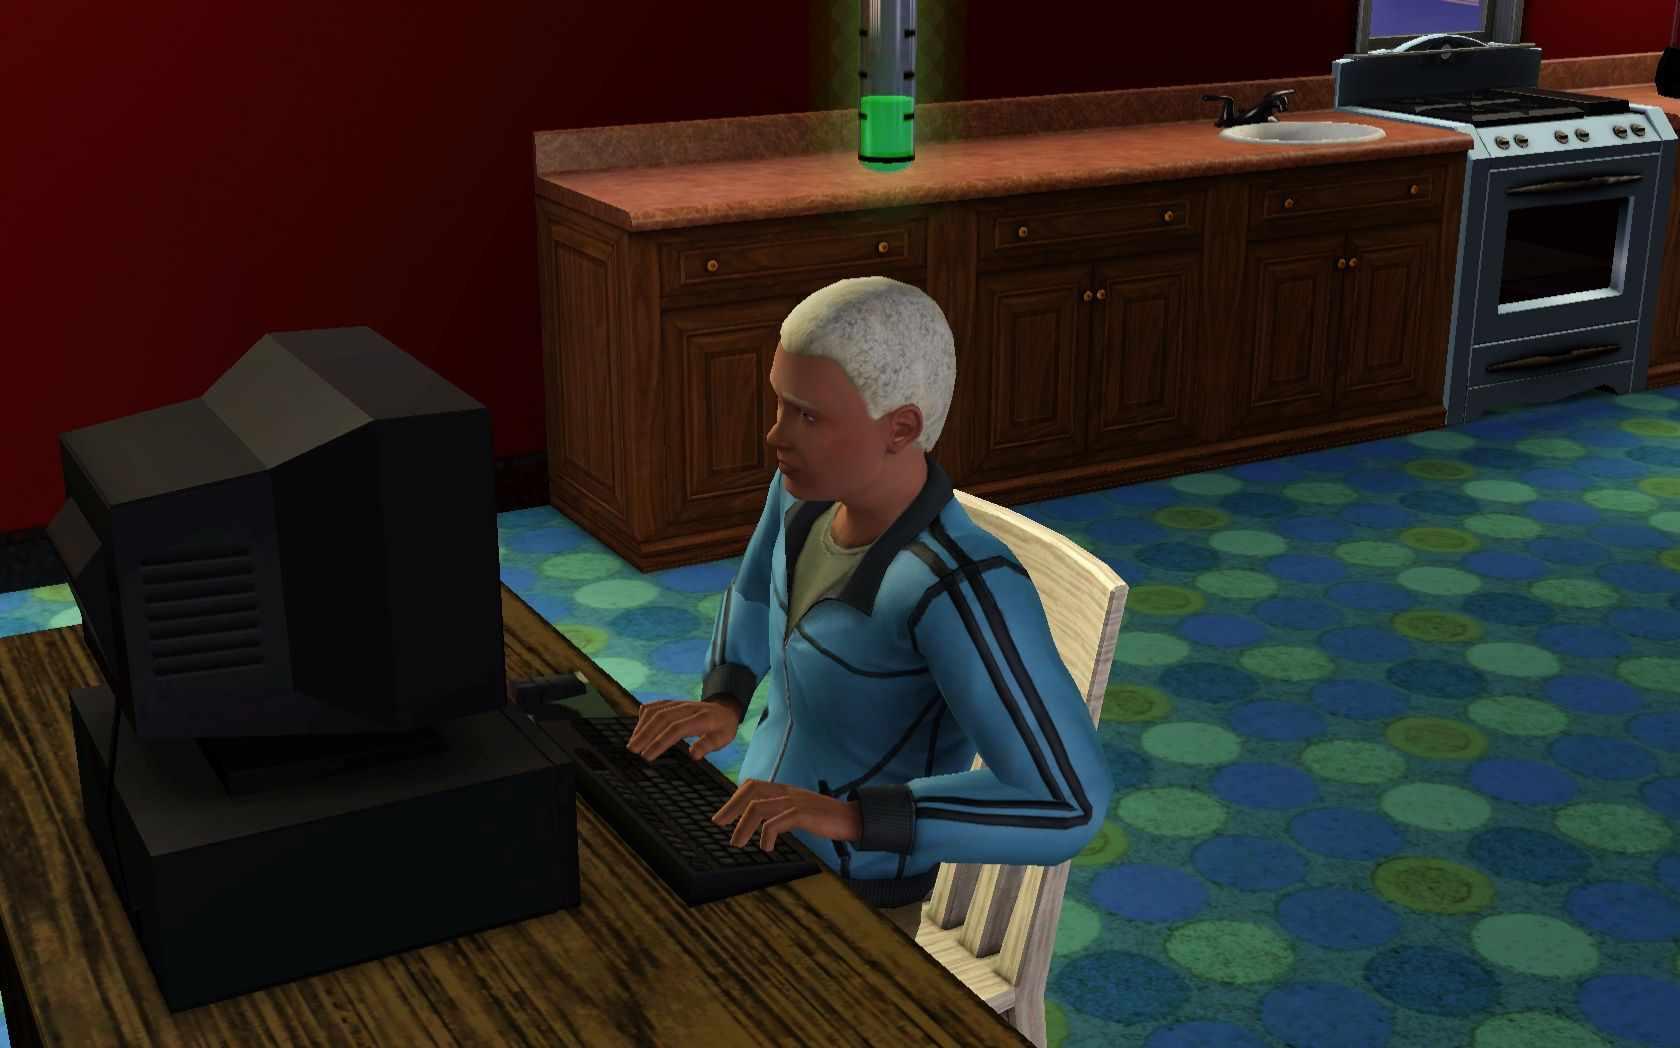 sims 3 workaholic writer